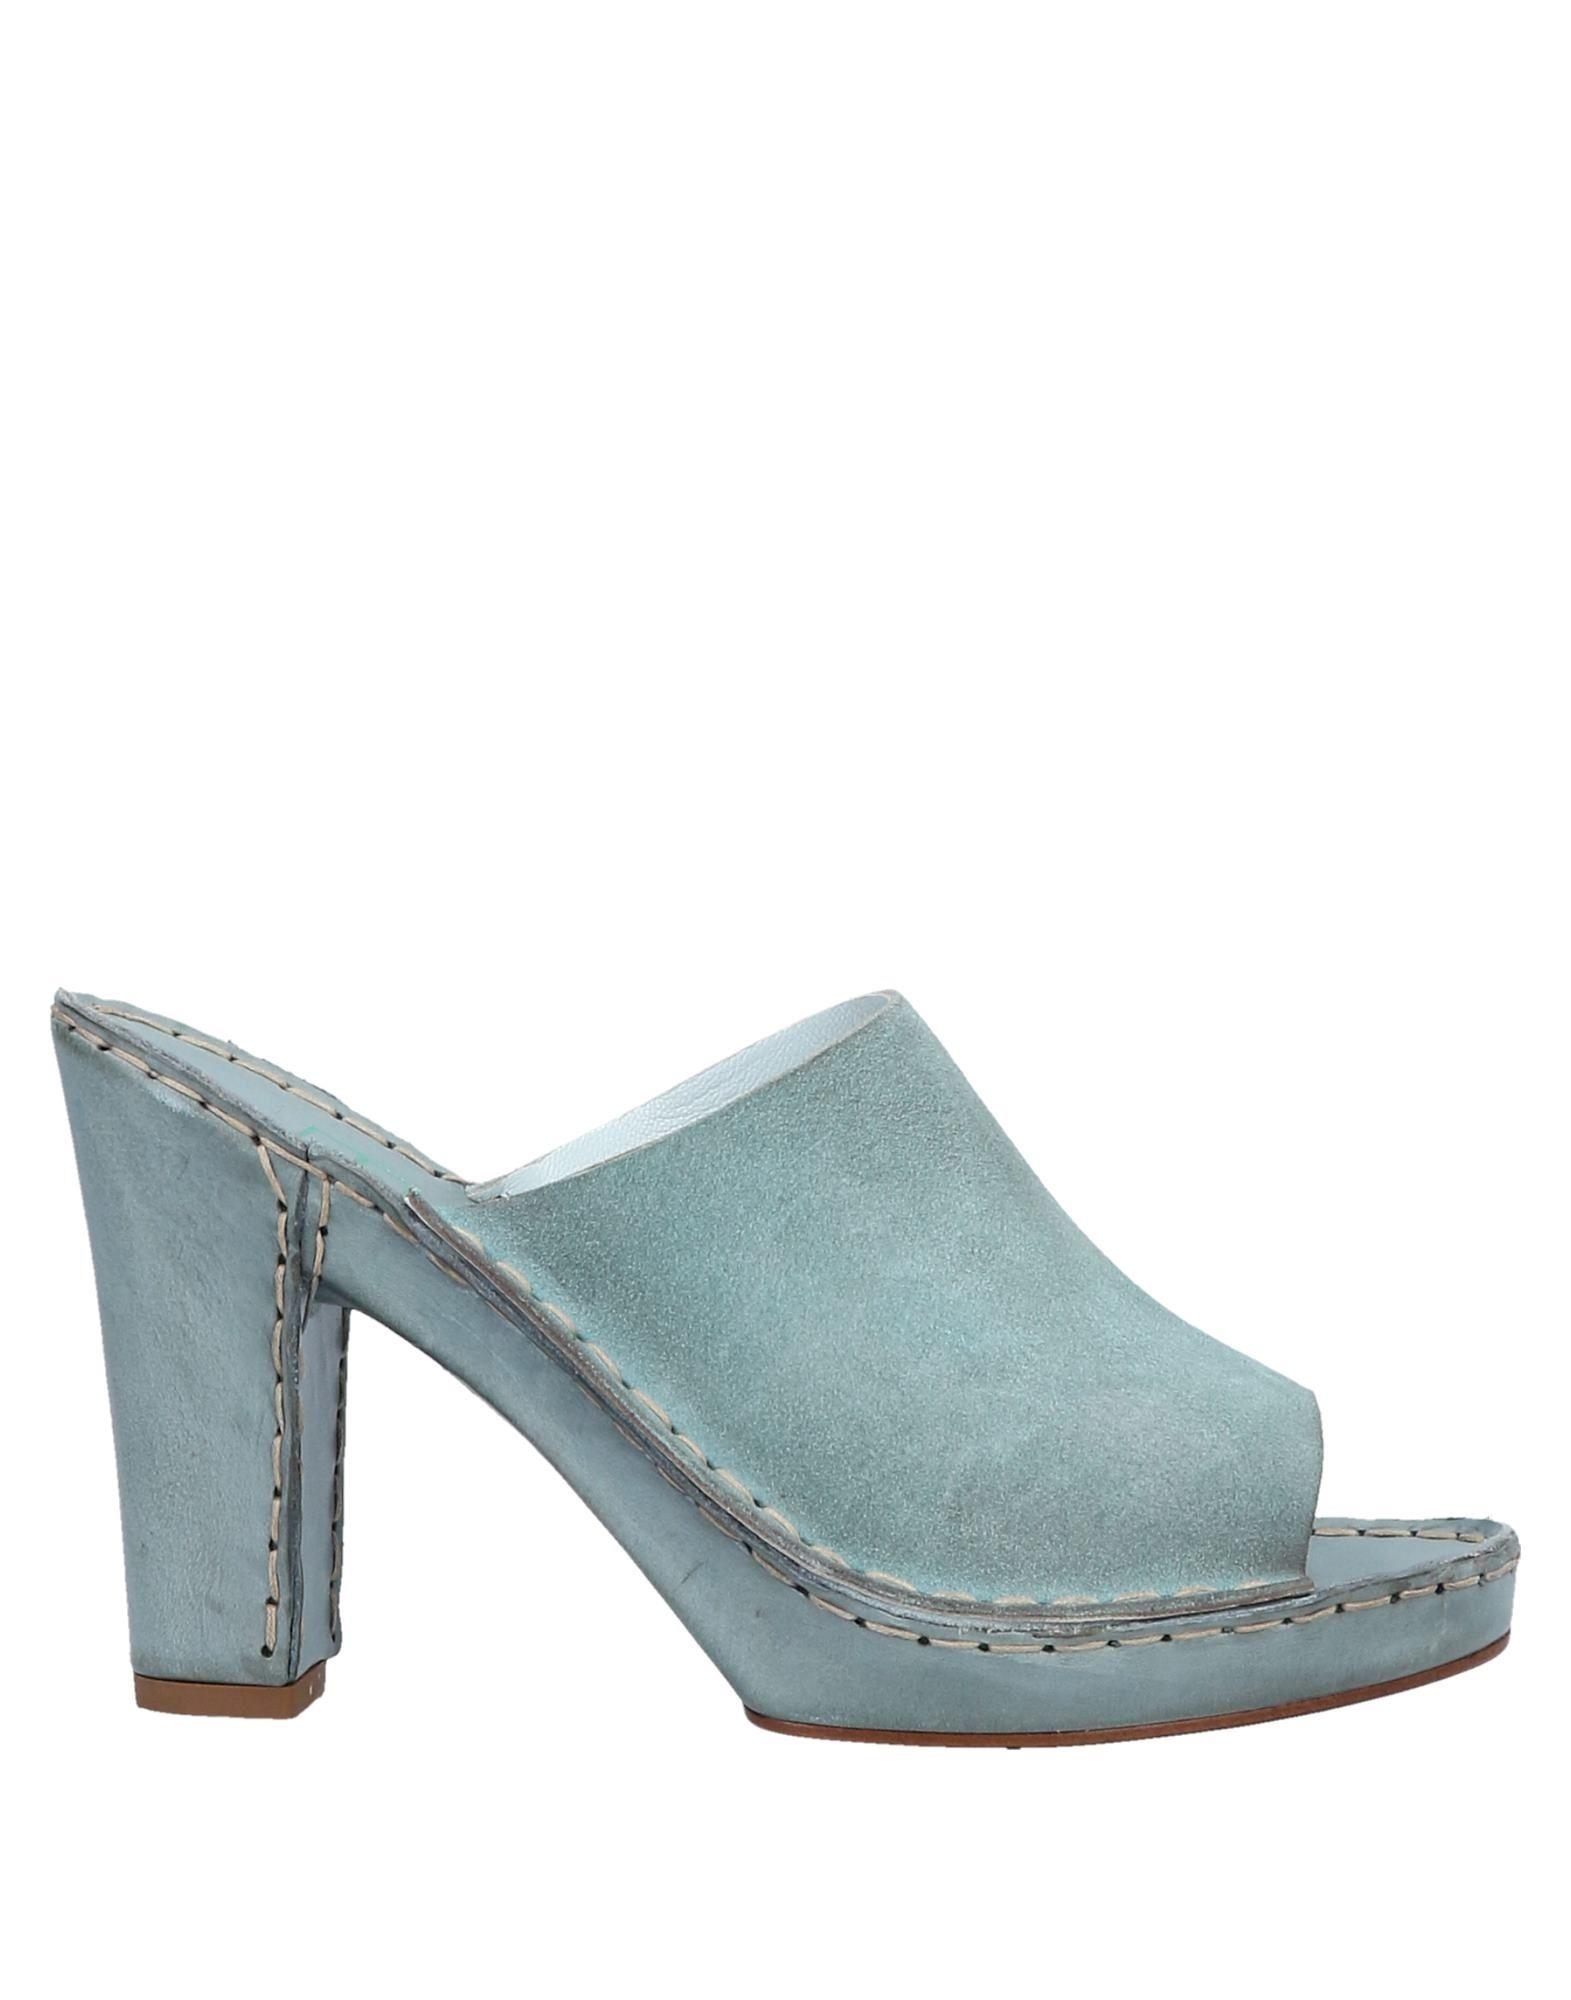 QSP+ QUELQUES SHOES DE PLUS Мюлес и сабо meotina high heels women shoes 2018 bow knot pointed toe party shoes pumps block high heels slip on ladies shoes plus size 43